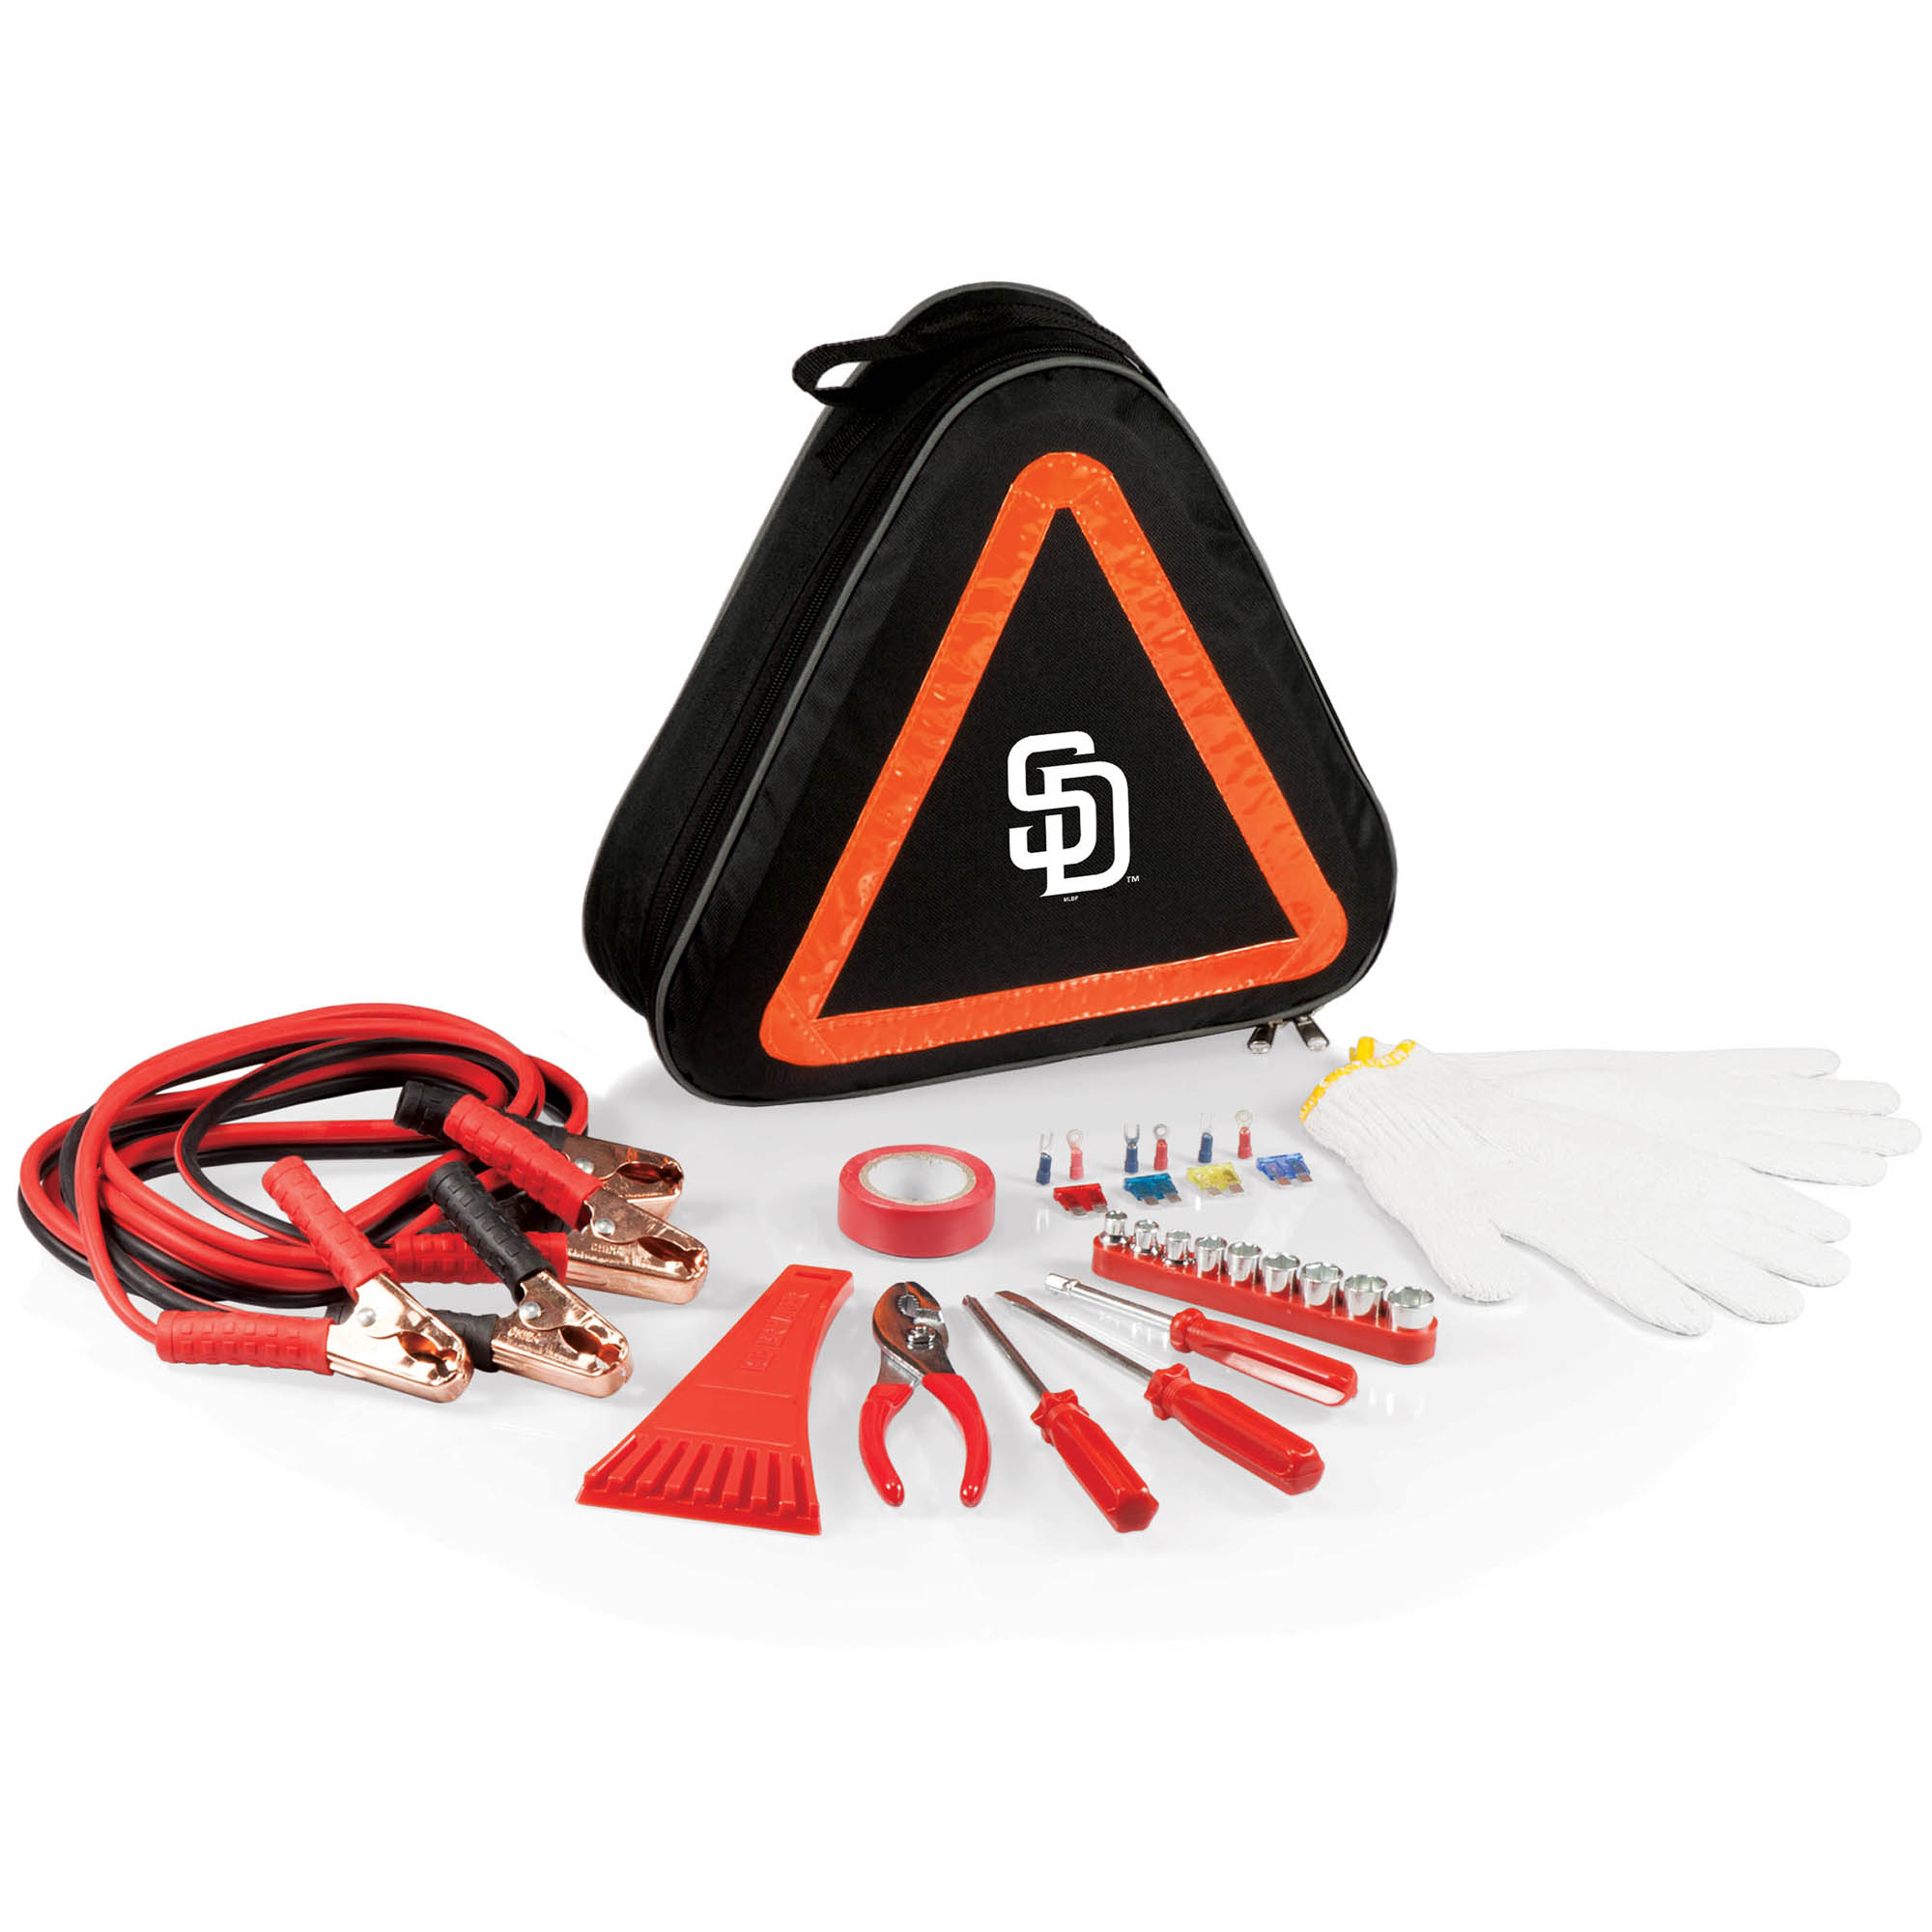 San Diego Padres Roadside Emergency Kit - No Size